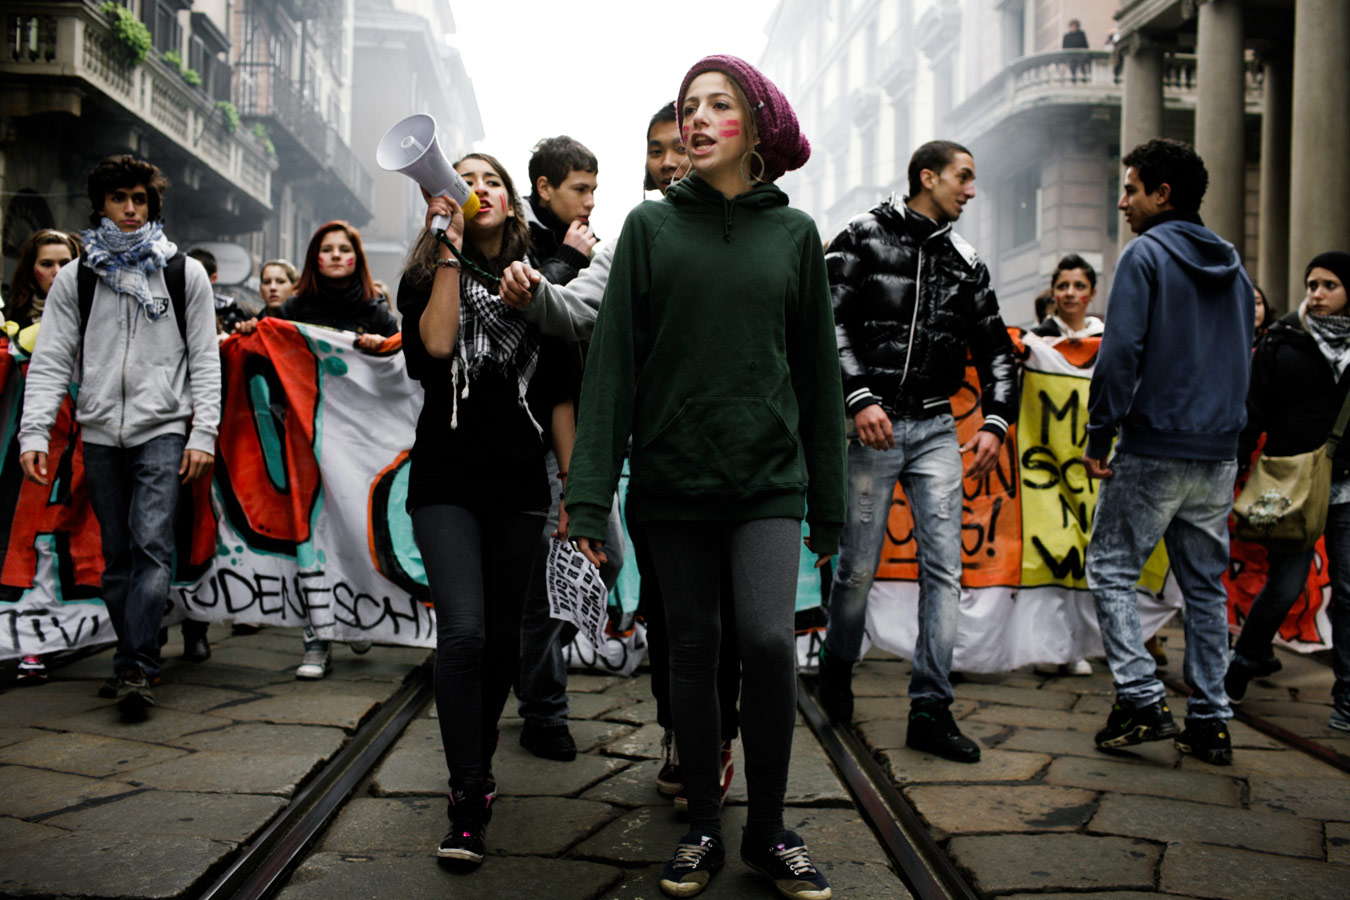 Malta International Photo Award